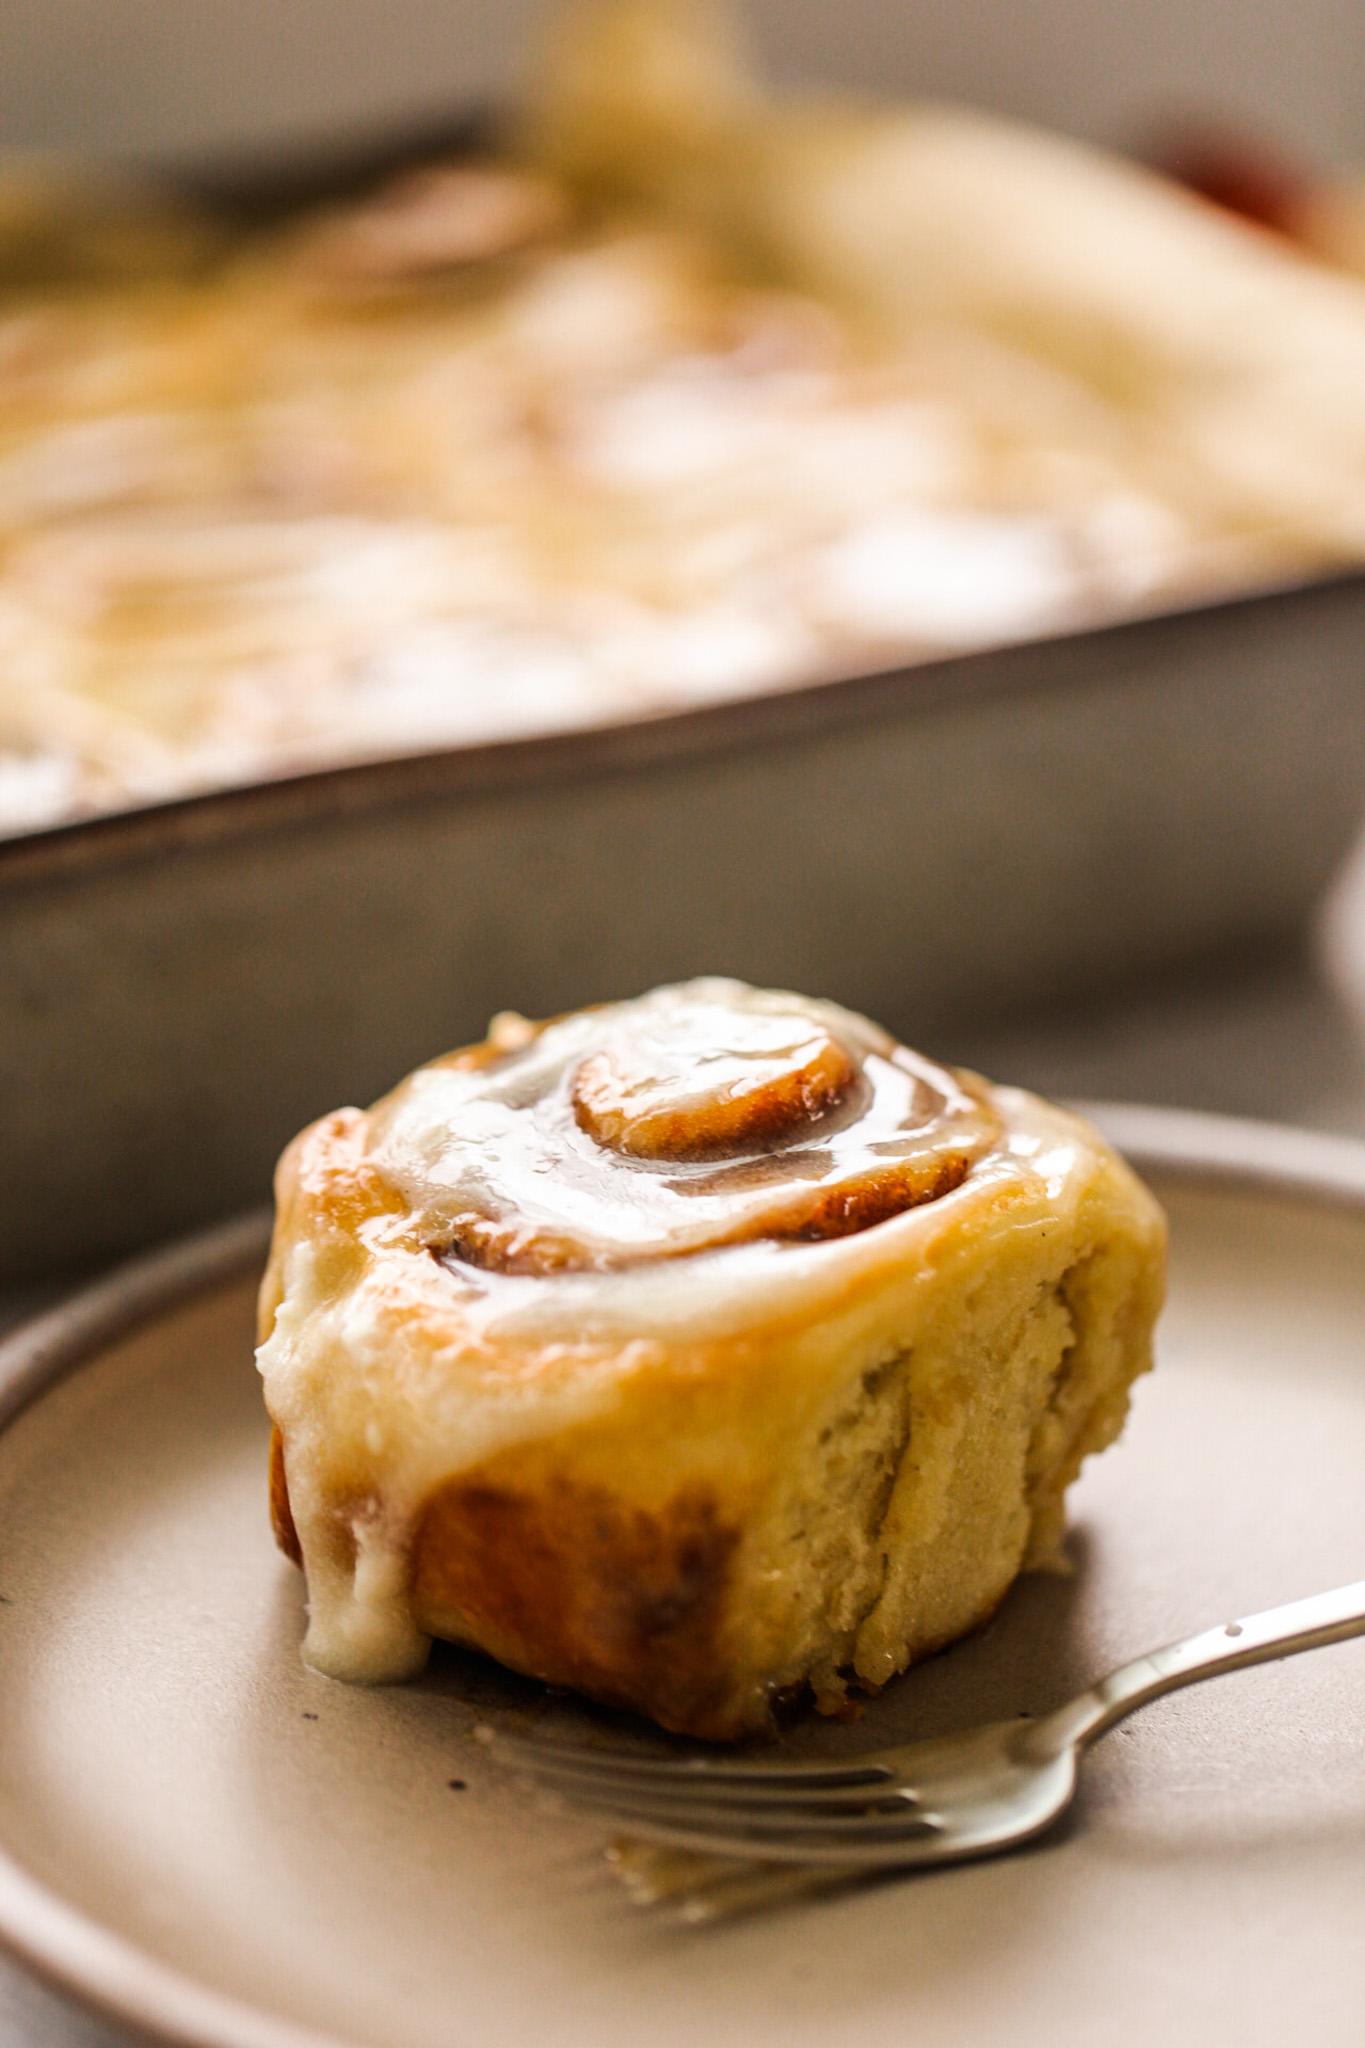 vegan cinnamon roll with glaze